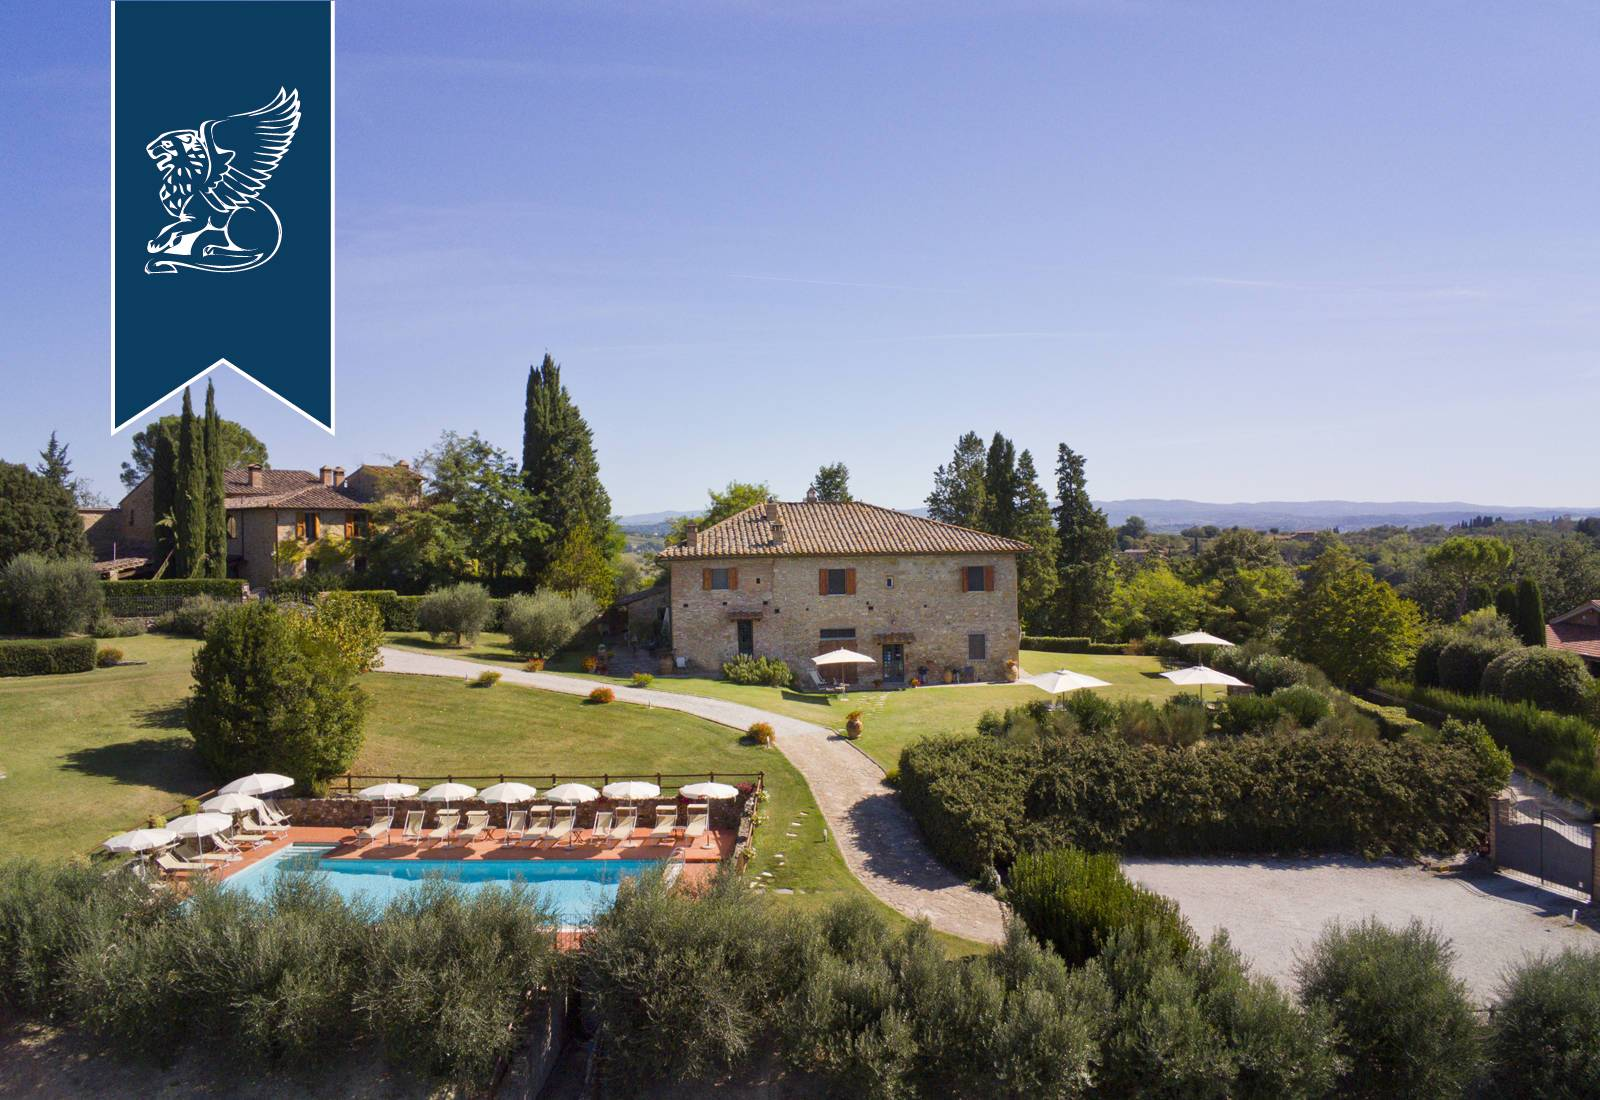 Agriturismo in Vendita a San Gimignano: 0 locali, 900 mq - Foto 9